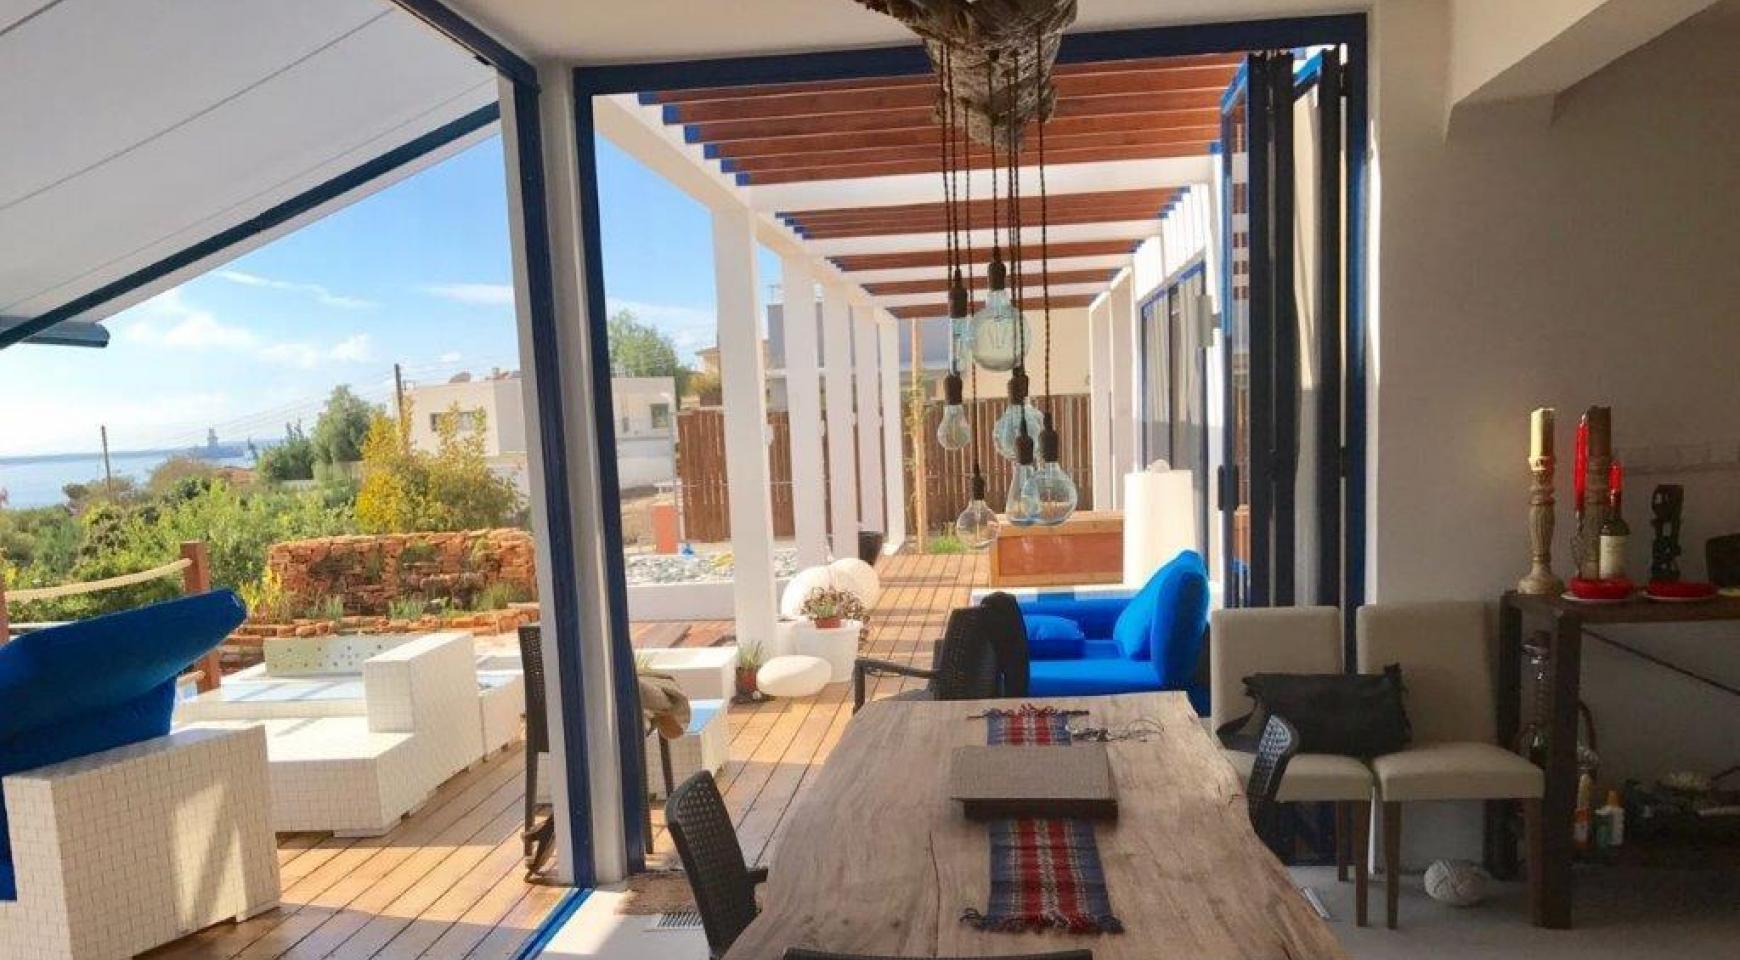 5-Спальная Вилла с видом на Море в районе  Agios Tychonas - 9